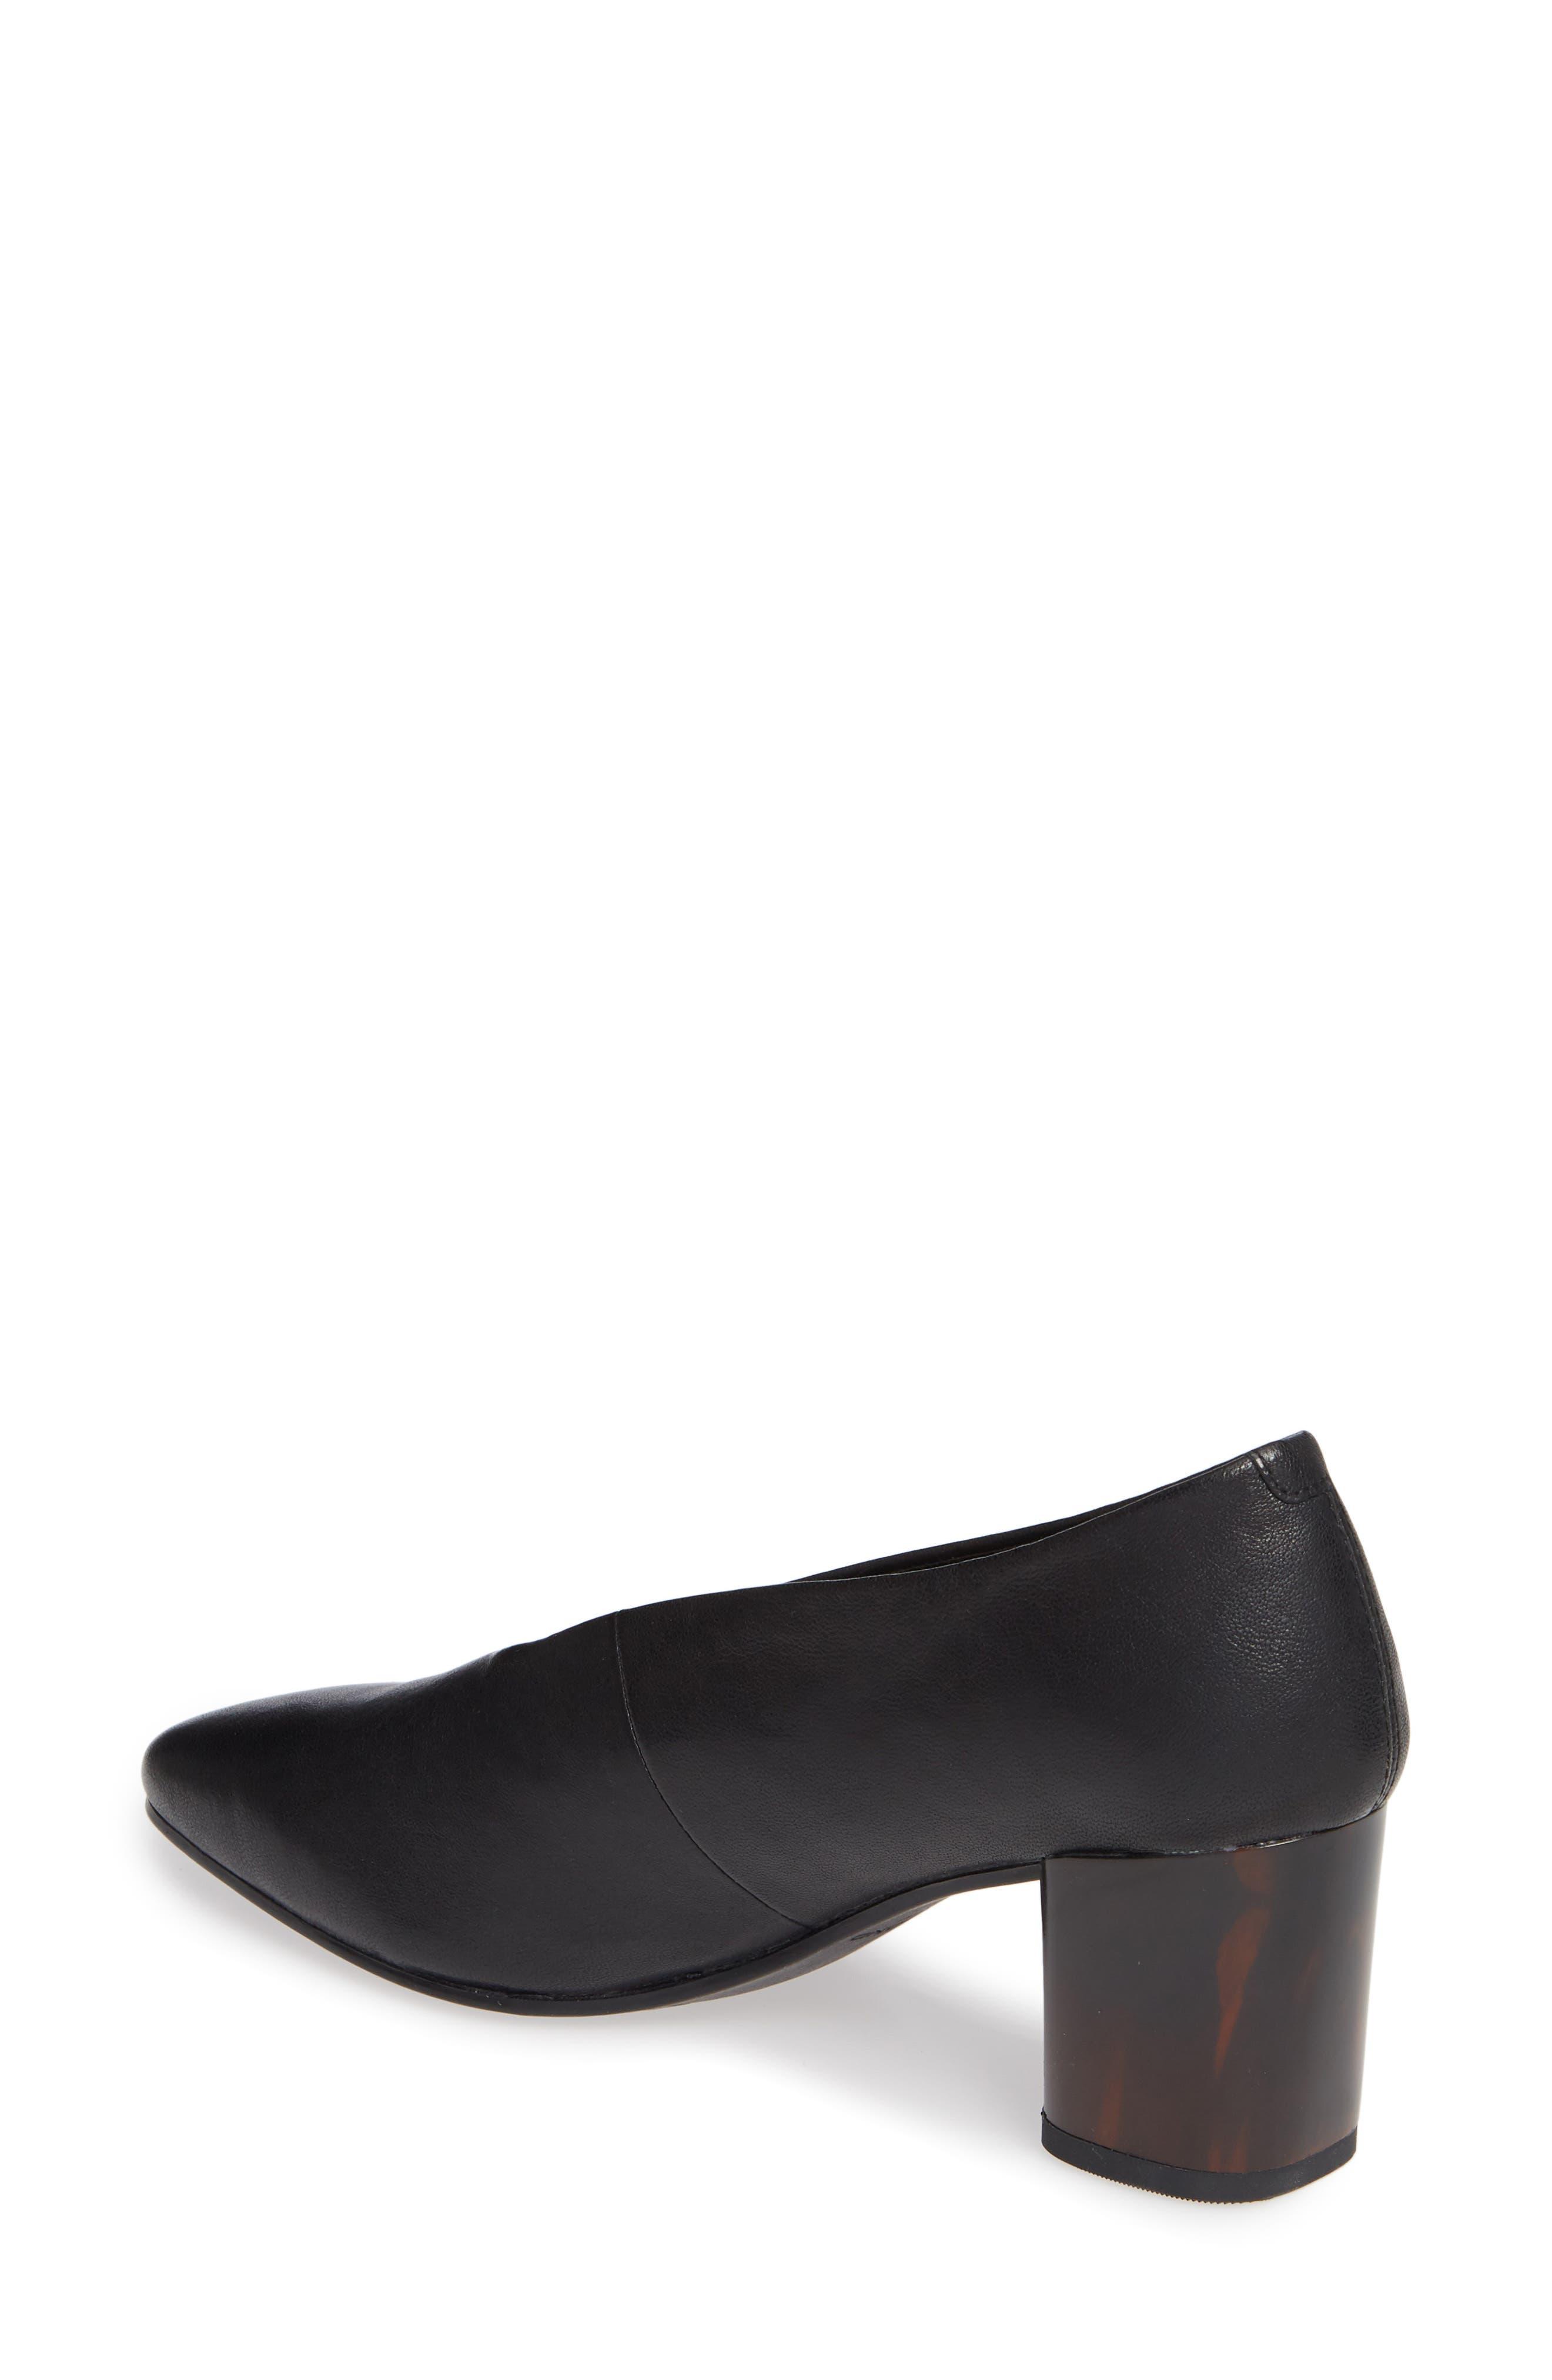 VAGABOND, Shoemakers Eve Pump, Alternate thumbnail 2, color, BLACK/ BLACK LEATHER